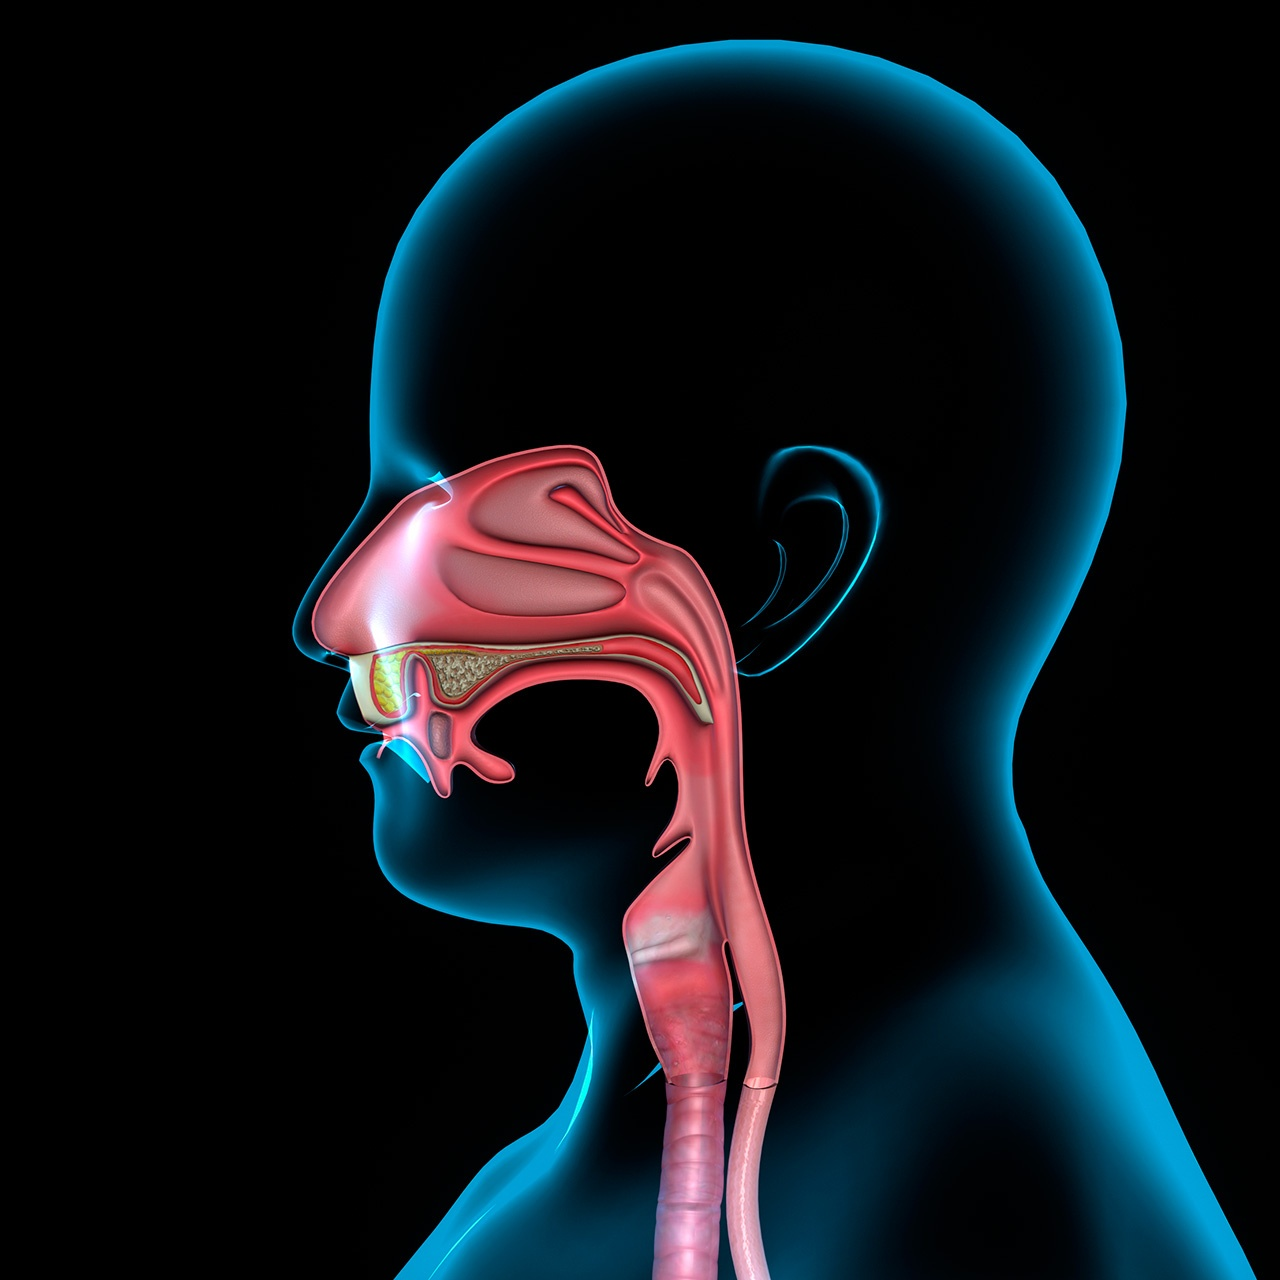 cancer-nasal-interno.jpg